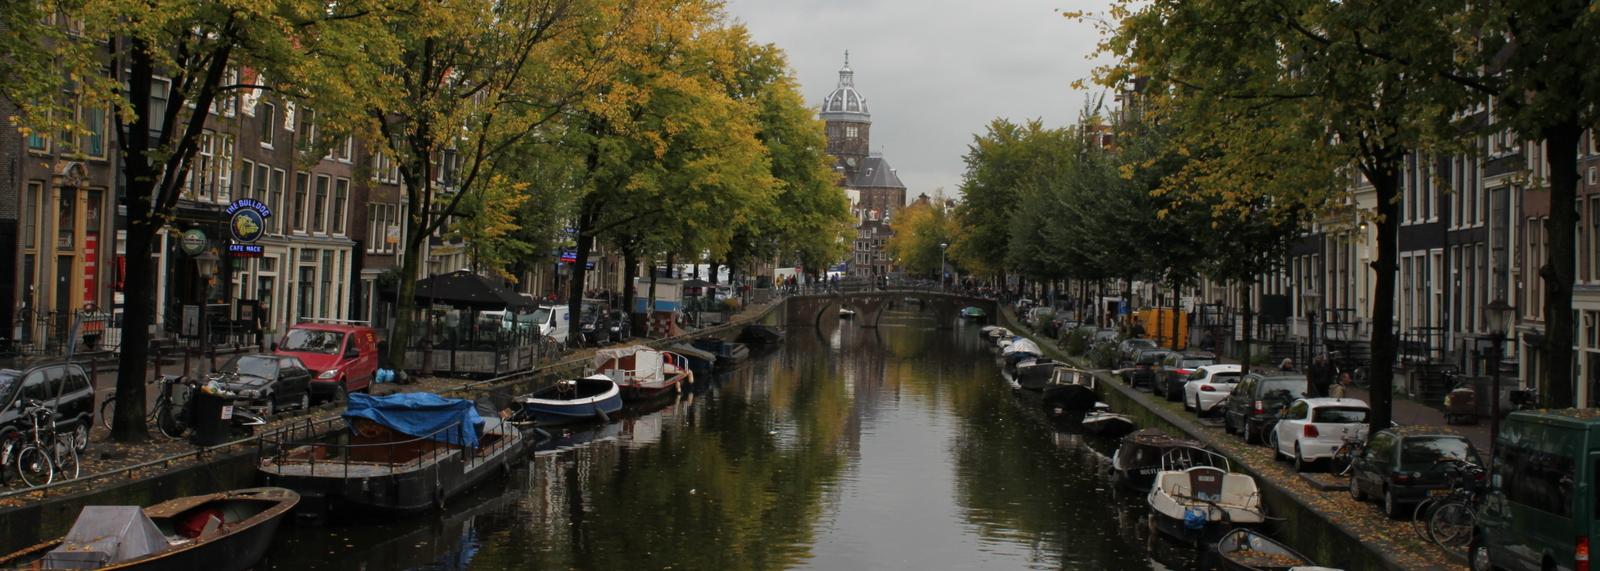 Grachten, Amsterdam